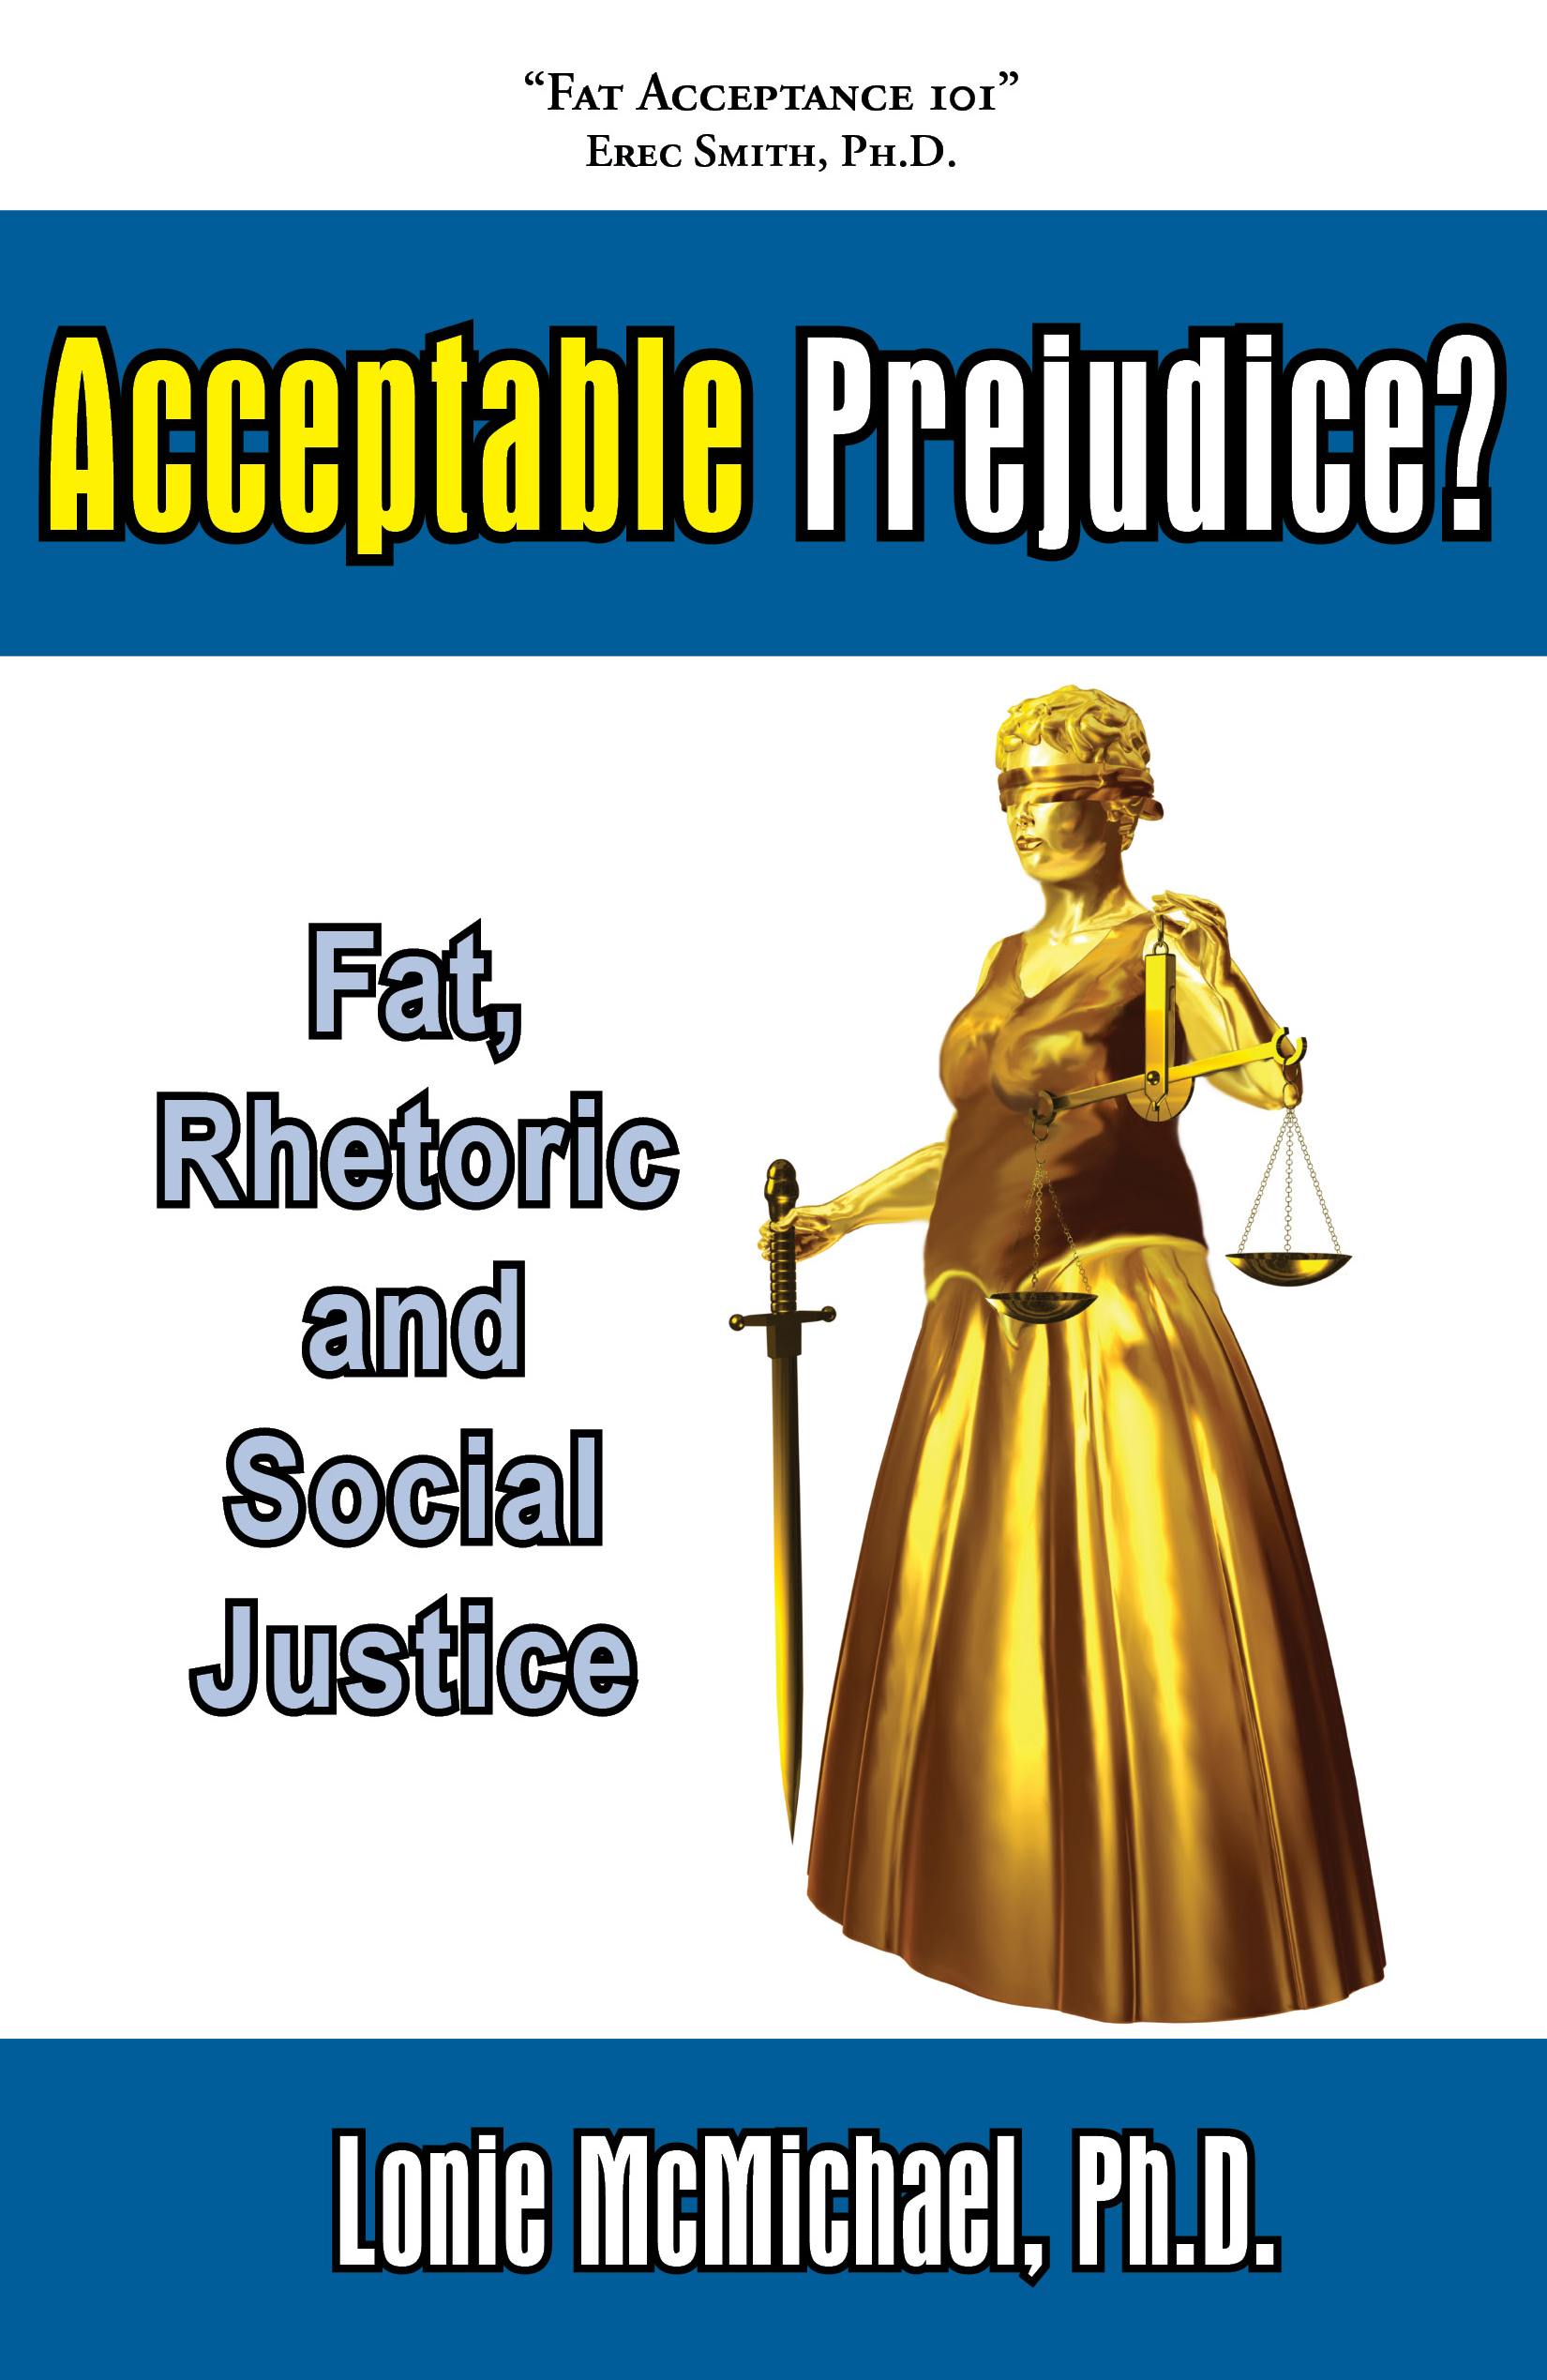 Acceptable Prejudice? Fat, Rhetoric and Social Justice